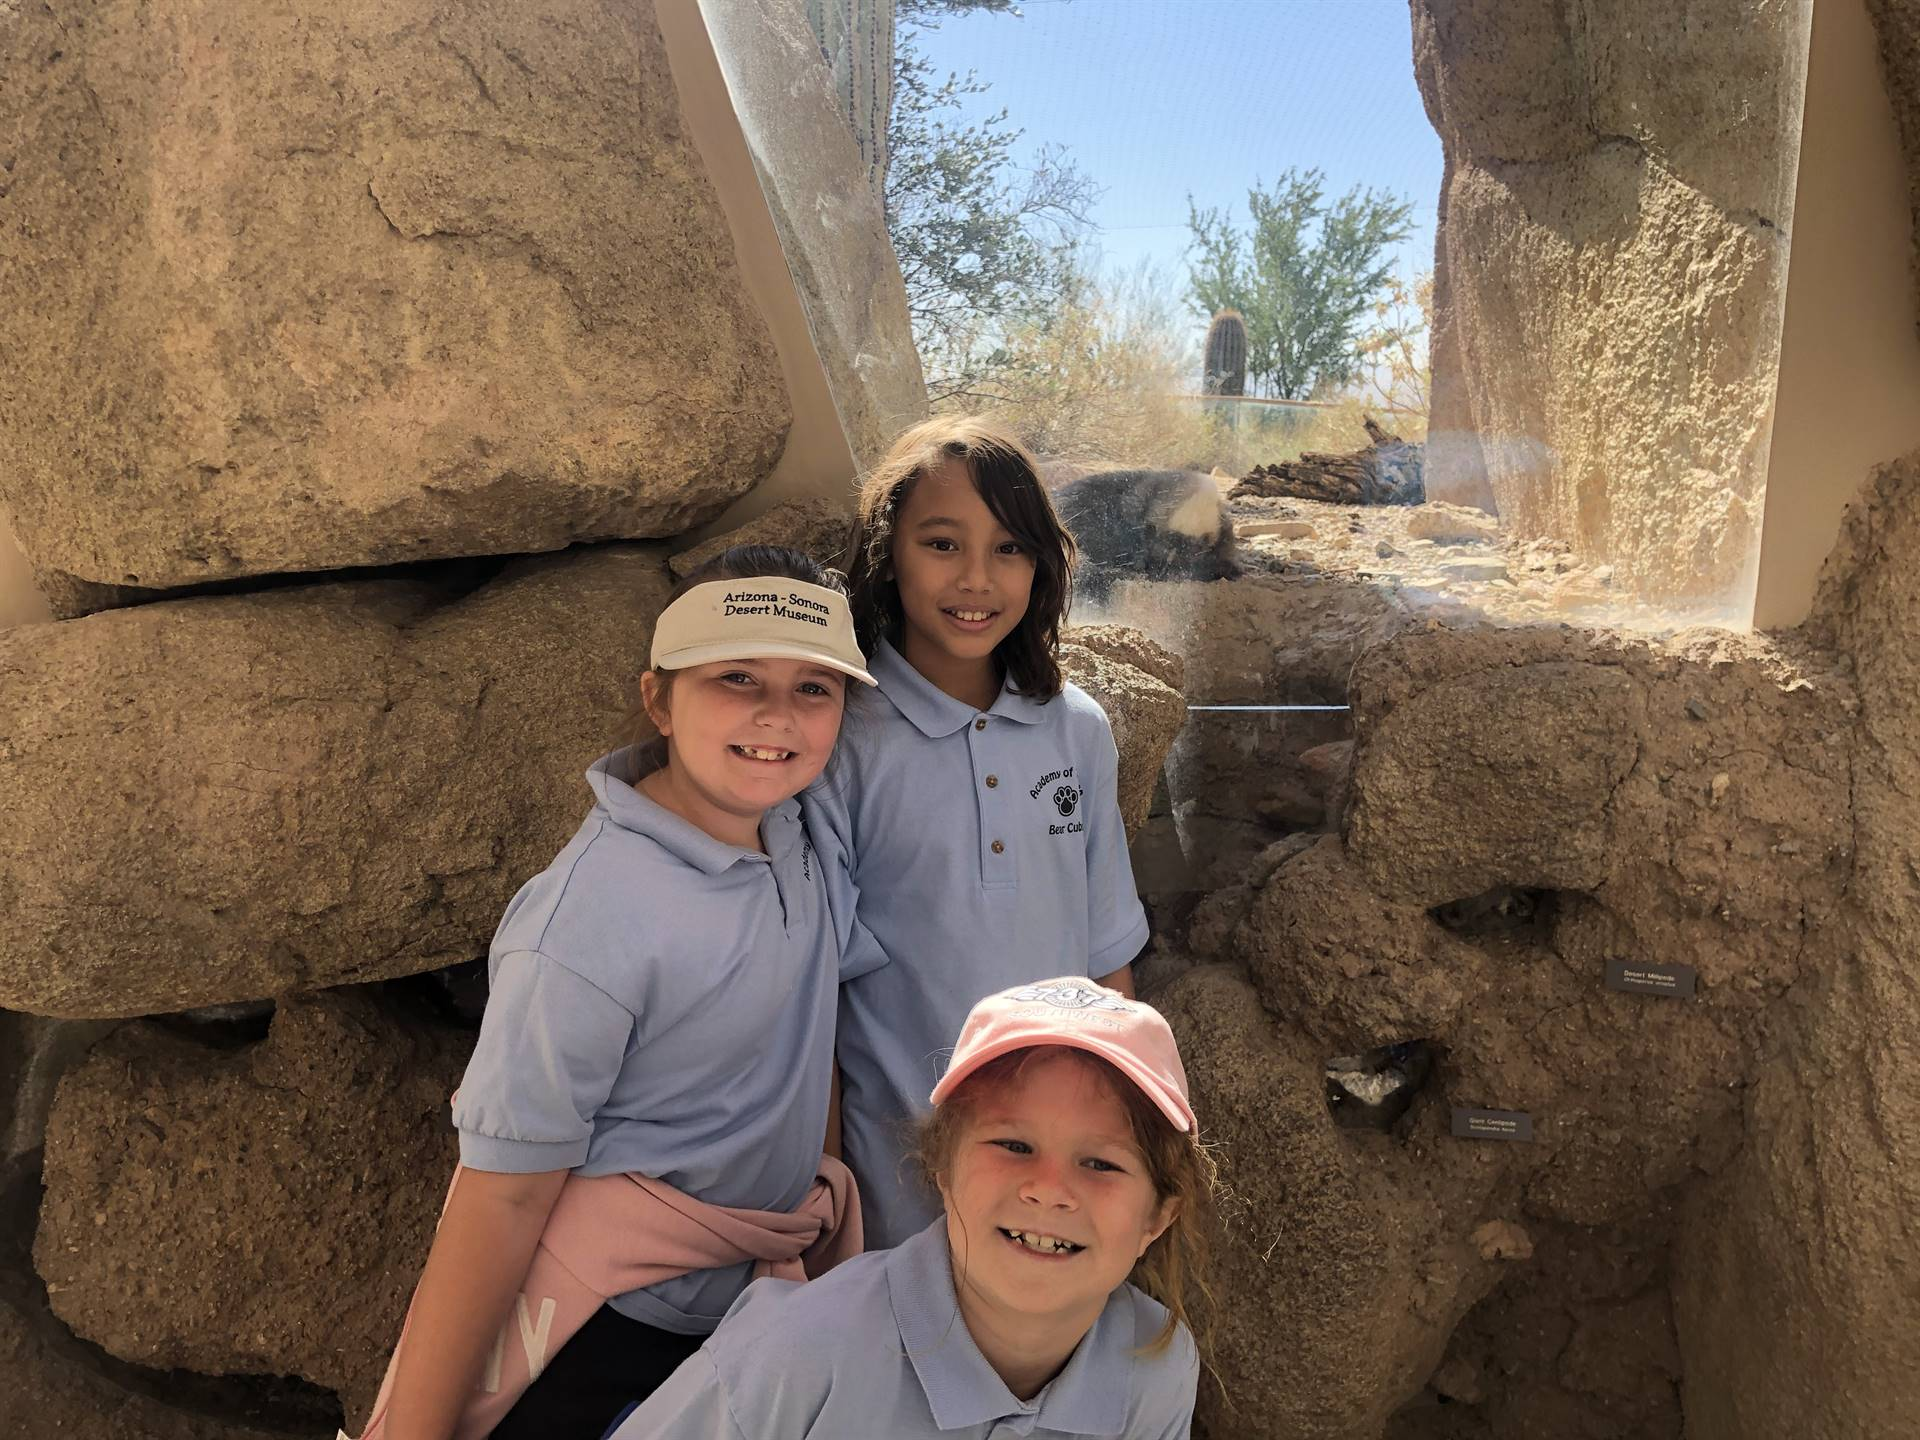 3 students near the prairie dog exhibit